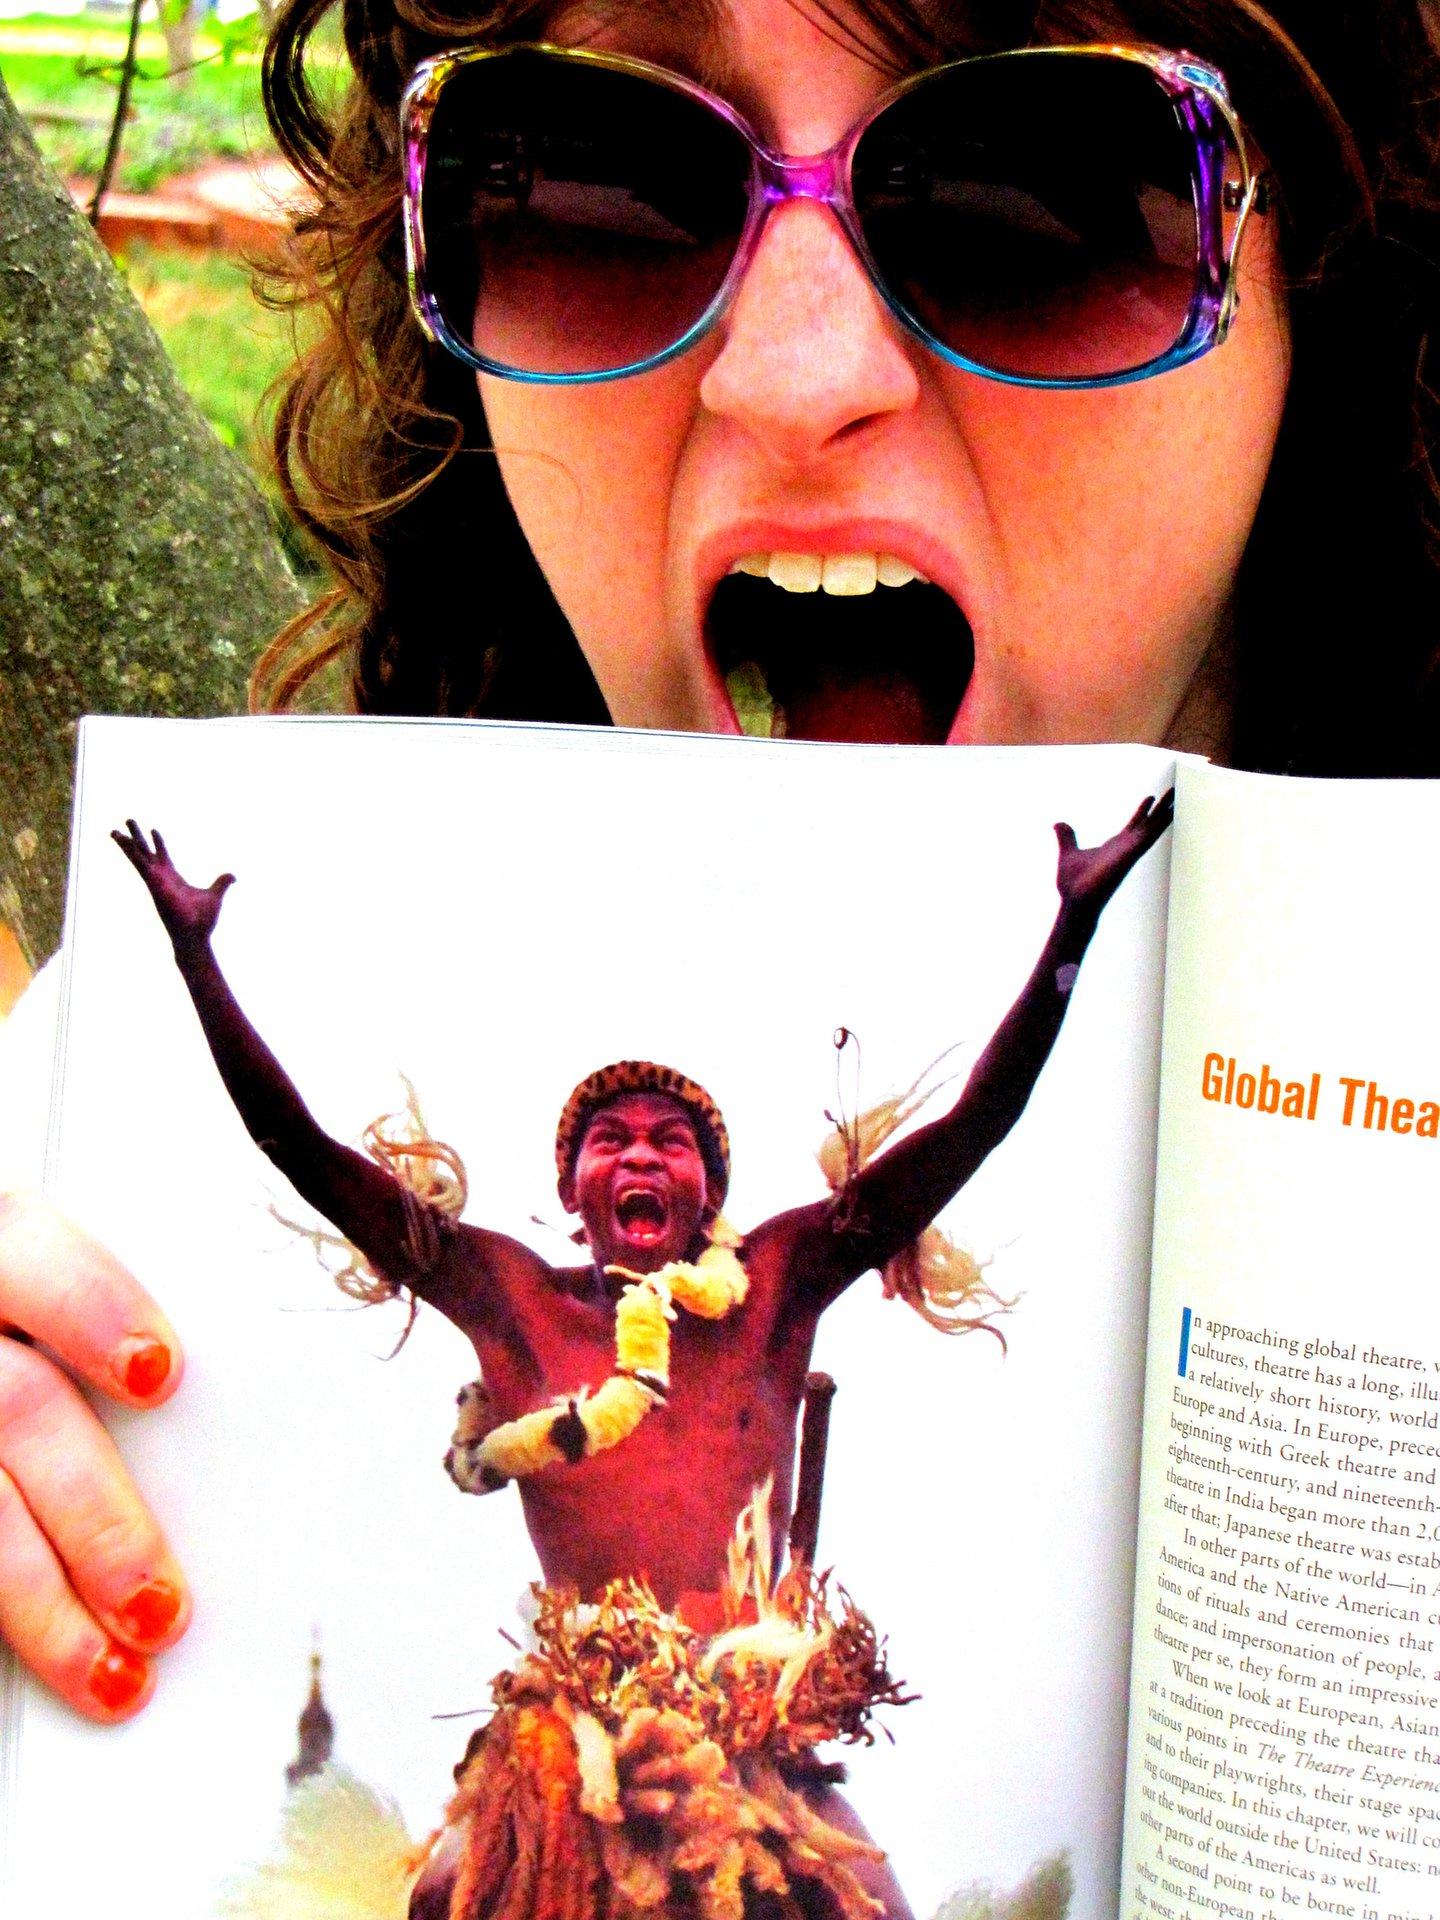 Global theatre trip